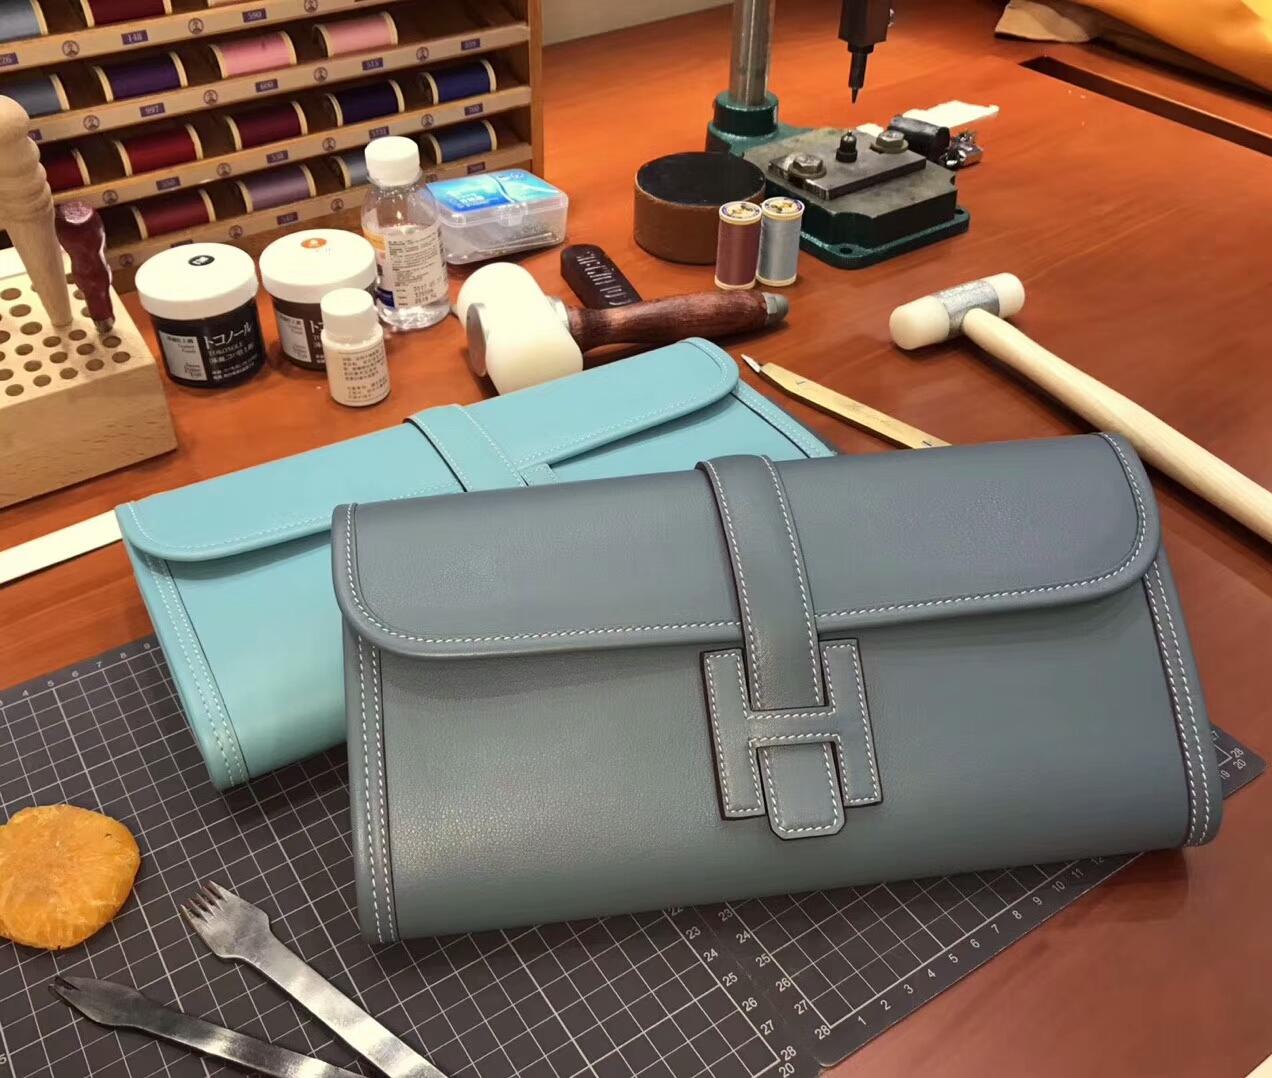 J7 亚麻蓝 Blue Lin HERMES 爱马仕 手包 配全套专柜原版包装